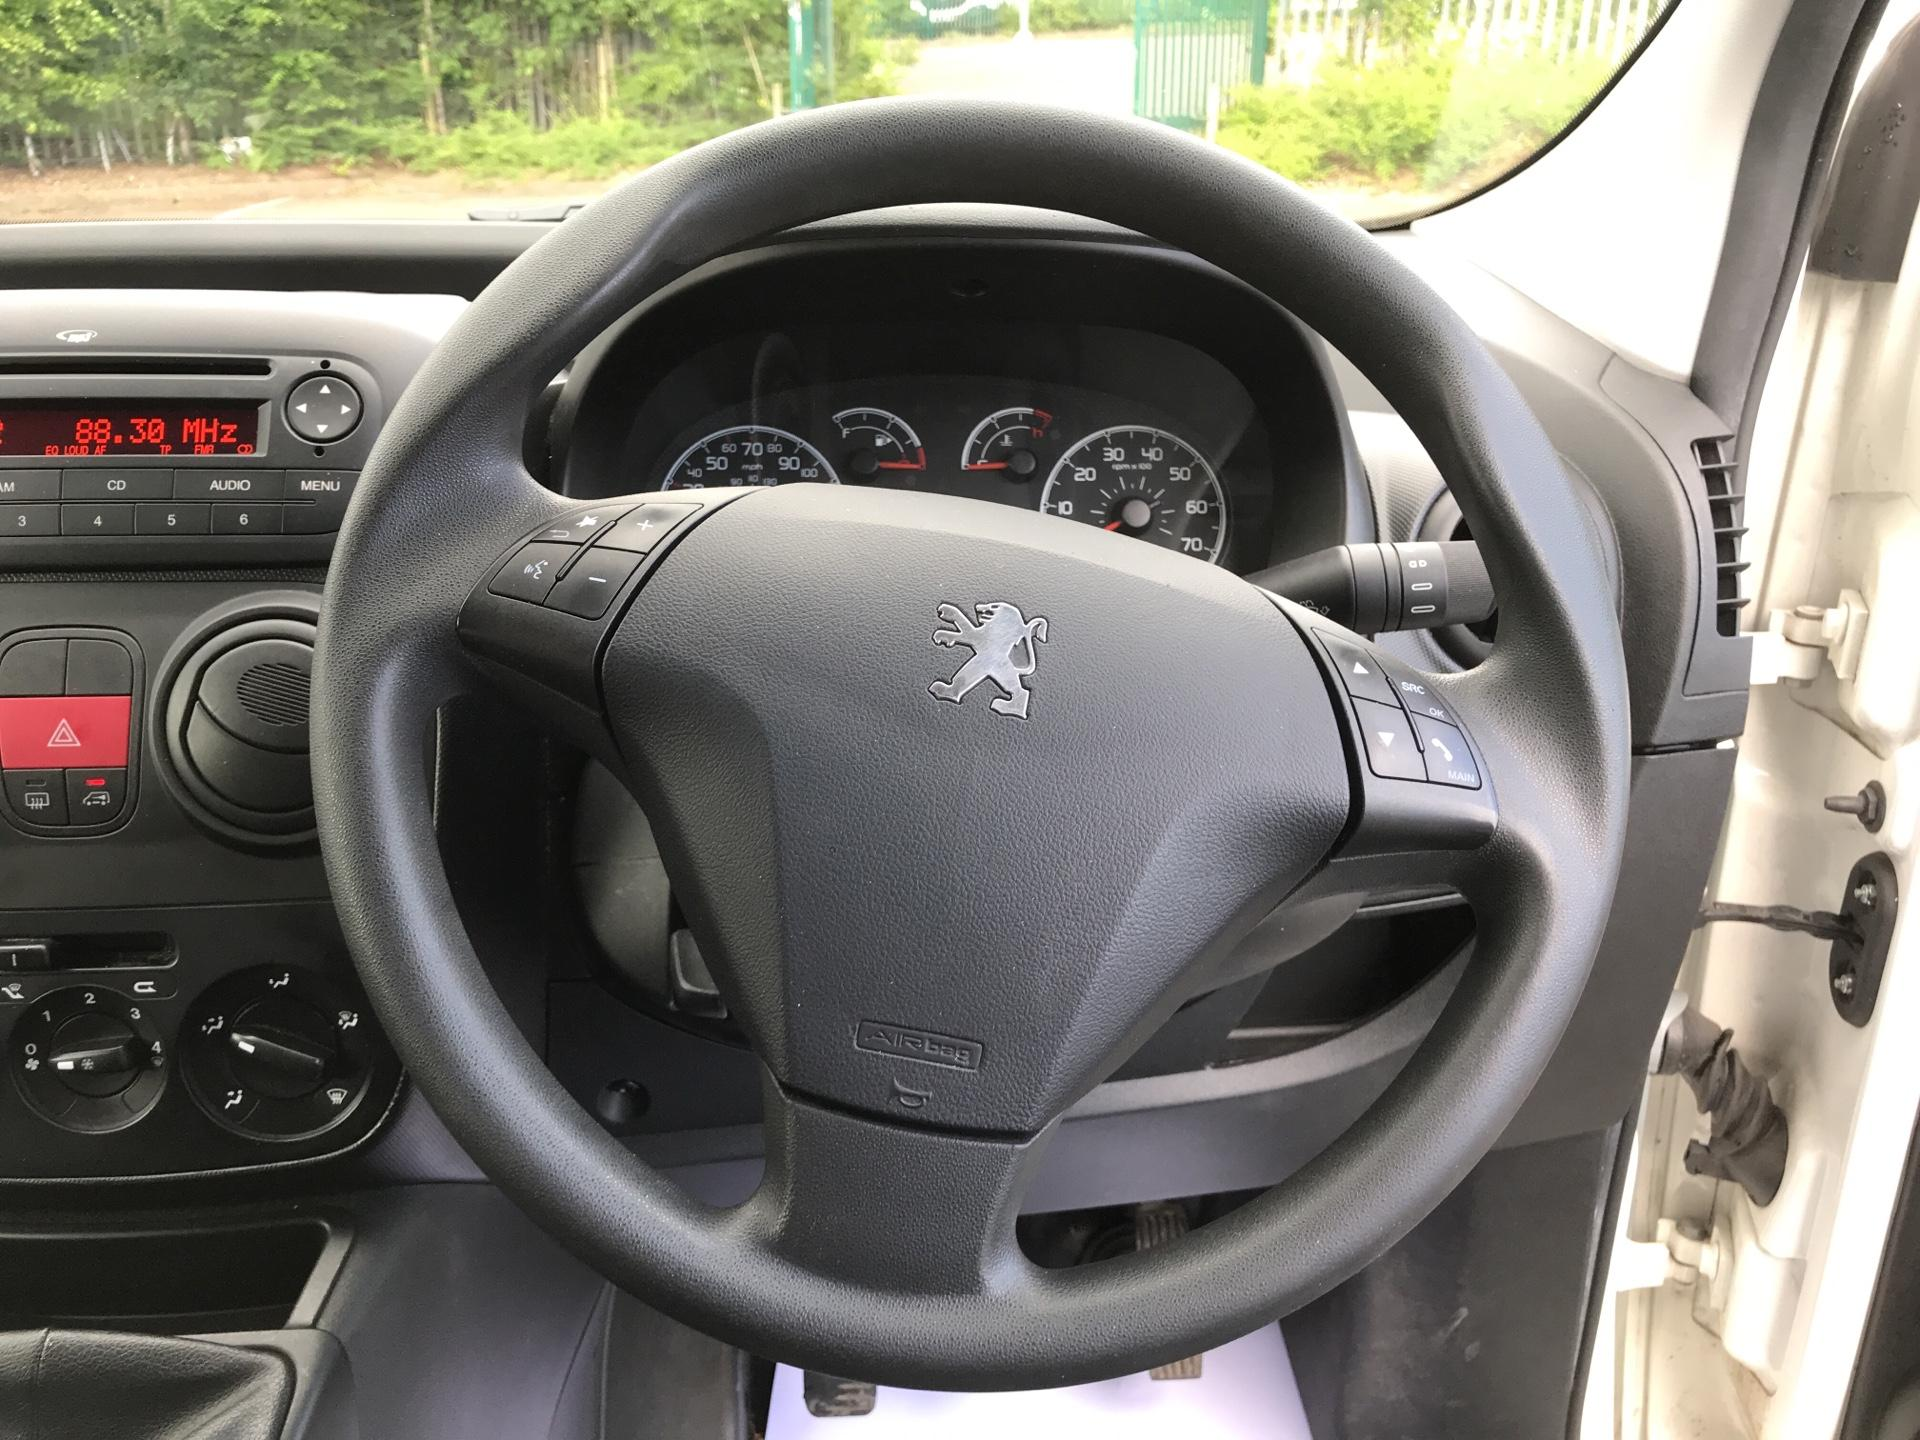 2015 Peugeot Bipper 1.3 Hdi 75 Professional [Non Start/Stop] (BG15DTN) Image 6